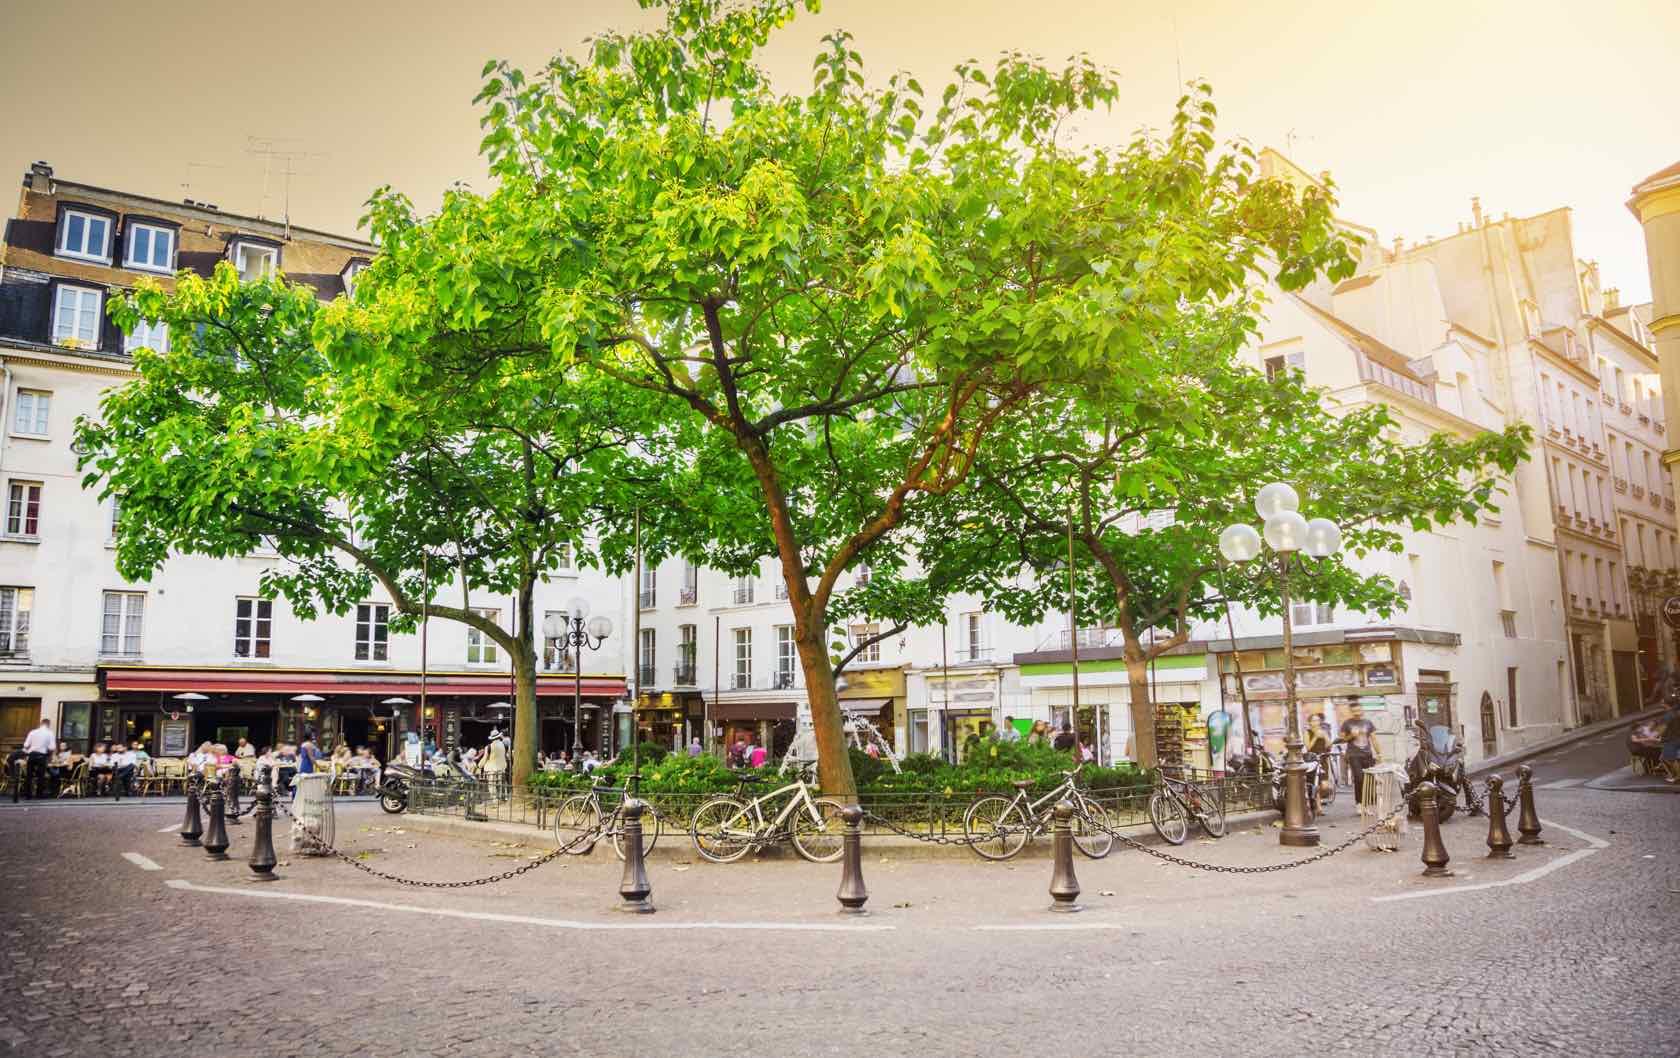 rue Mouffetard in Paris